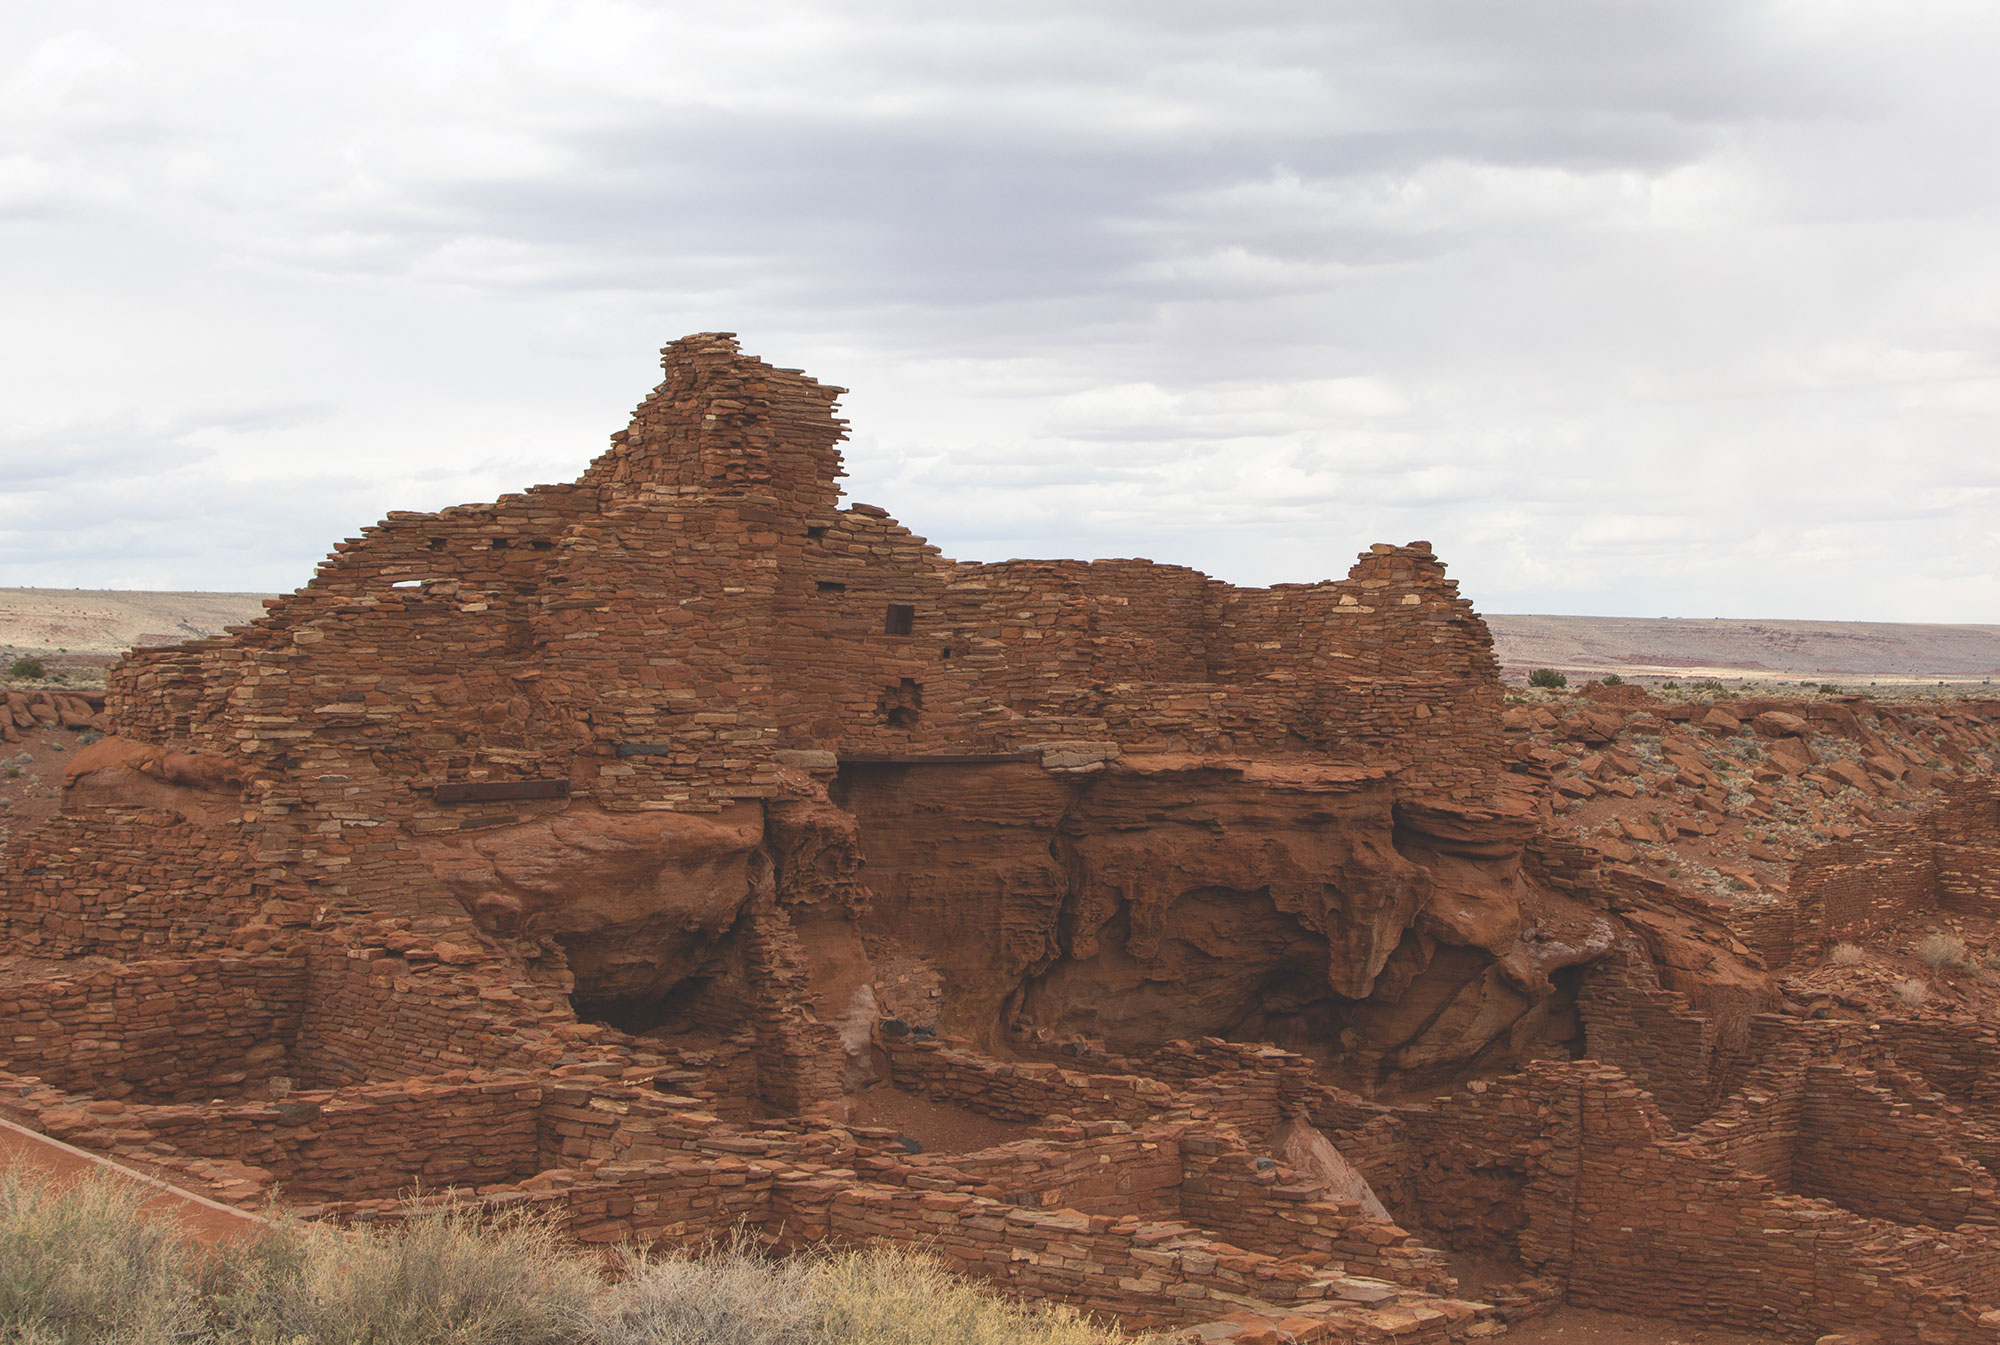 Wupatki National Monument; Photo by Leah LeMoine